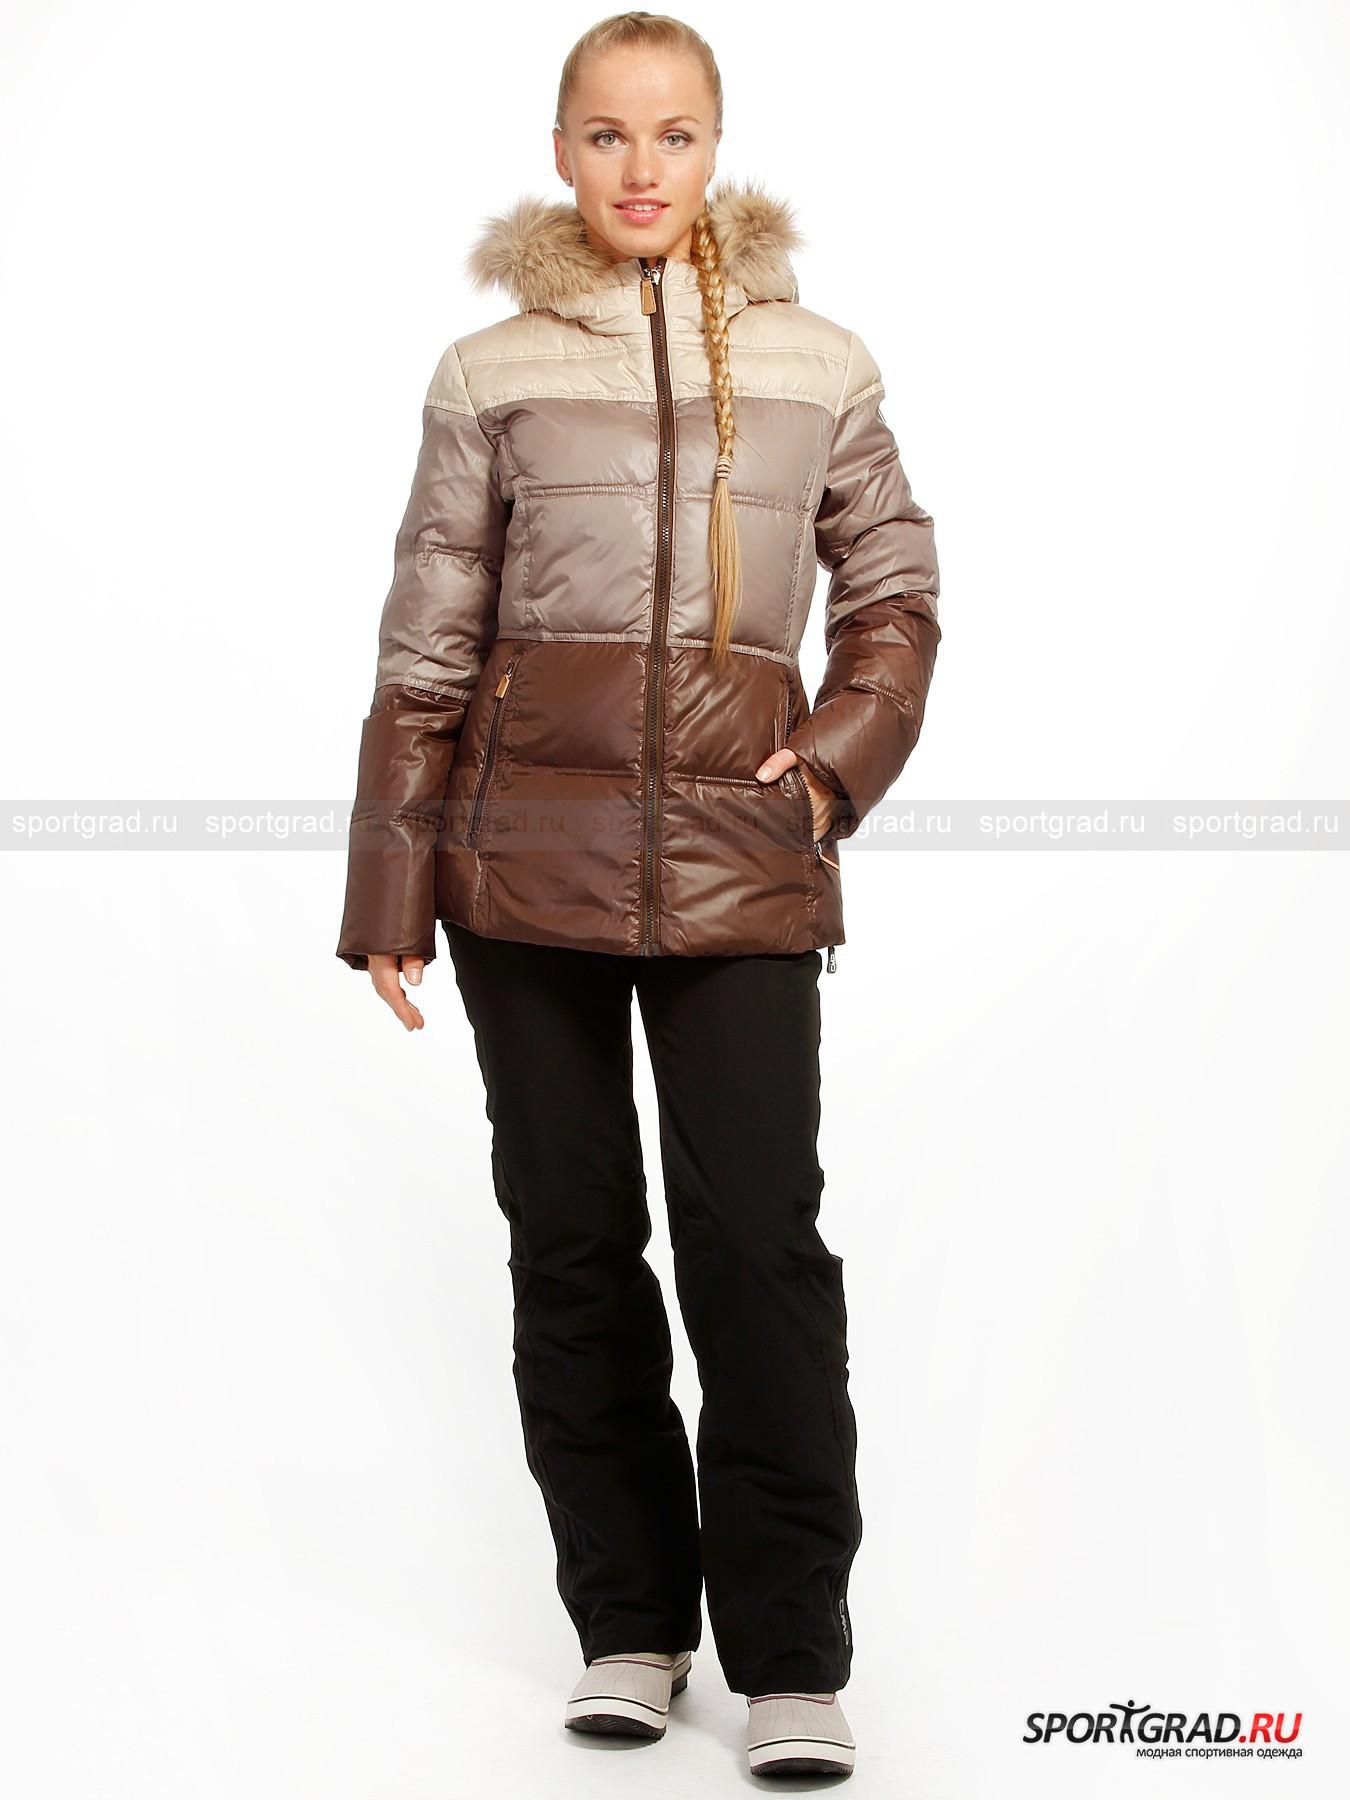 Куртка женская  LADY FIX  HOOD JACKET CAMPAGNOLO от Спортград